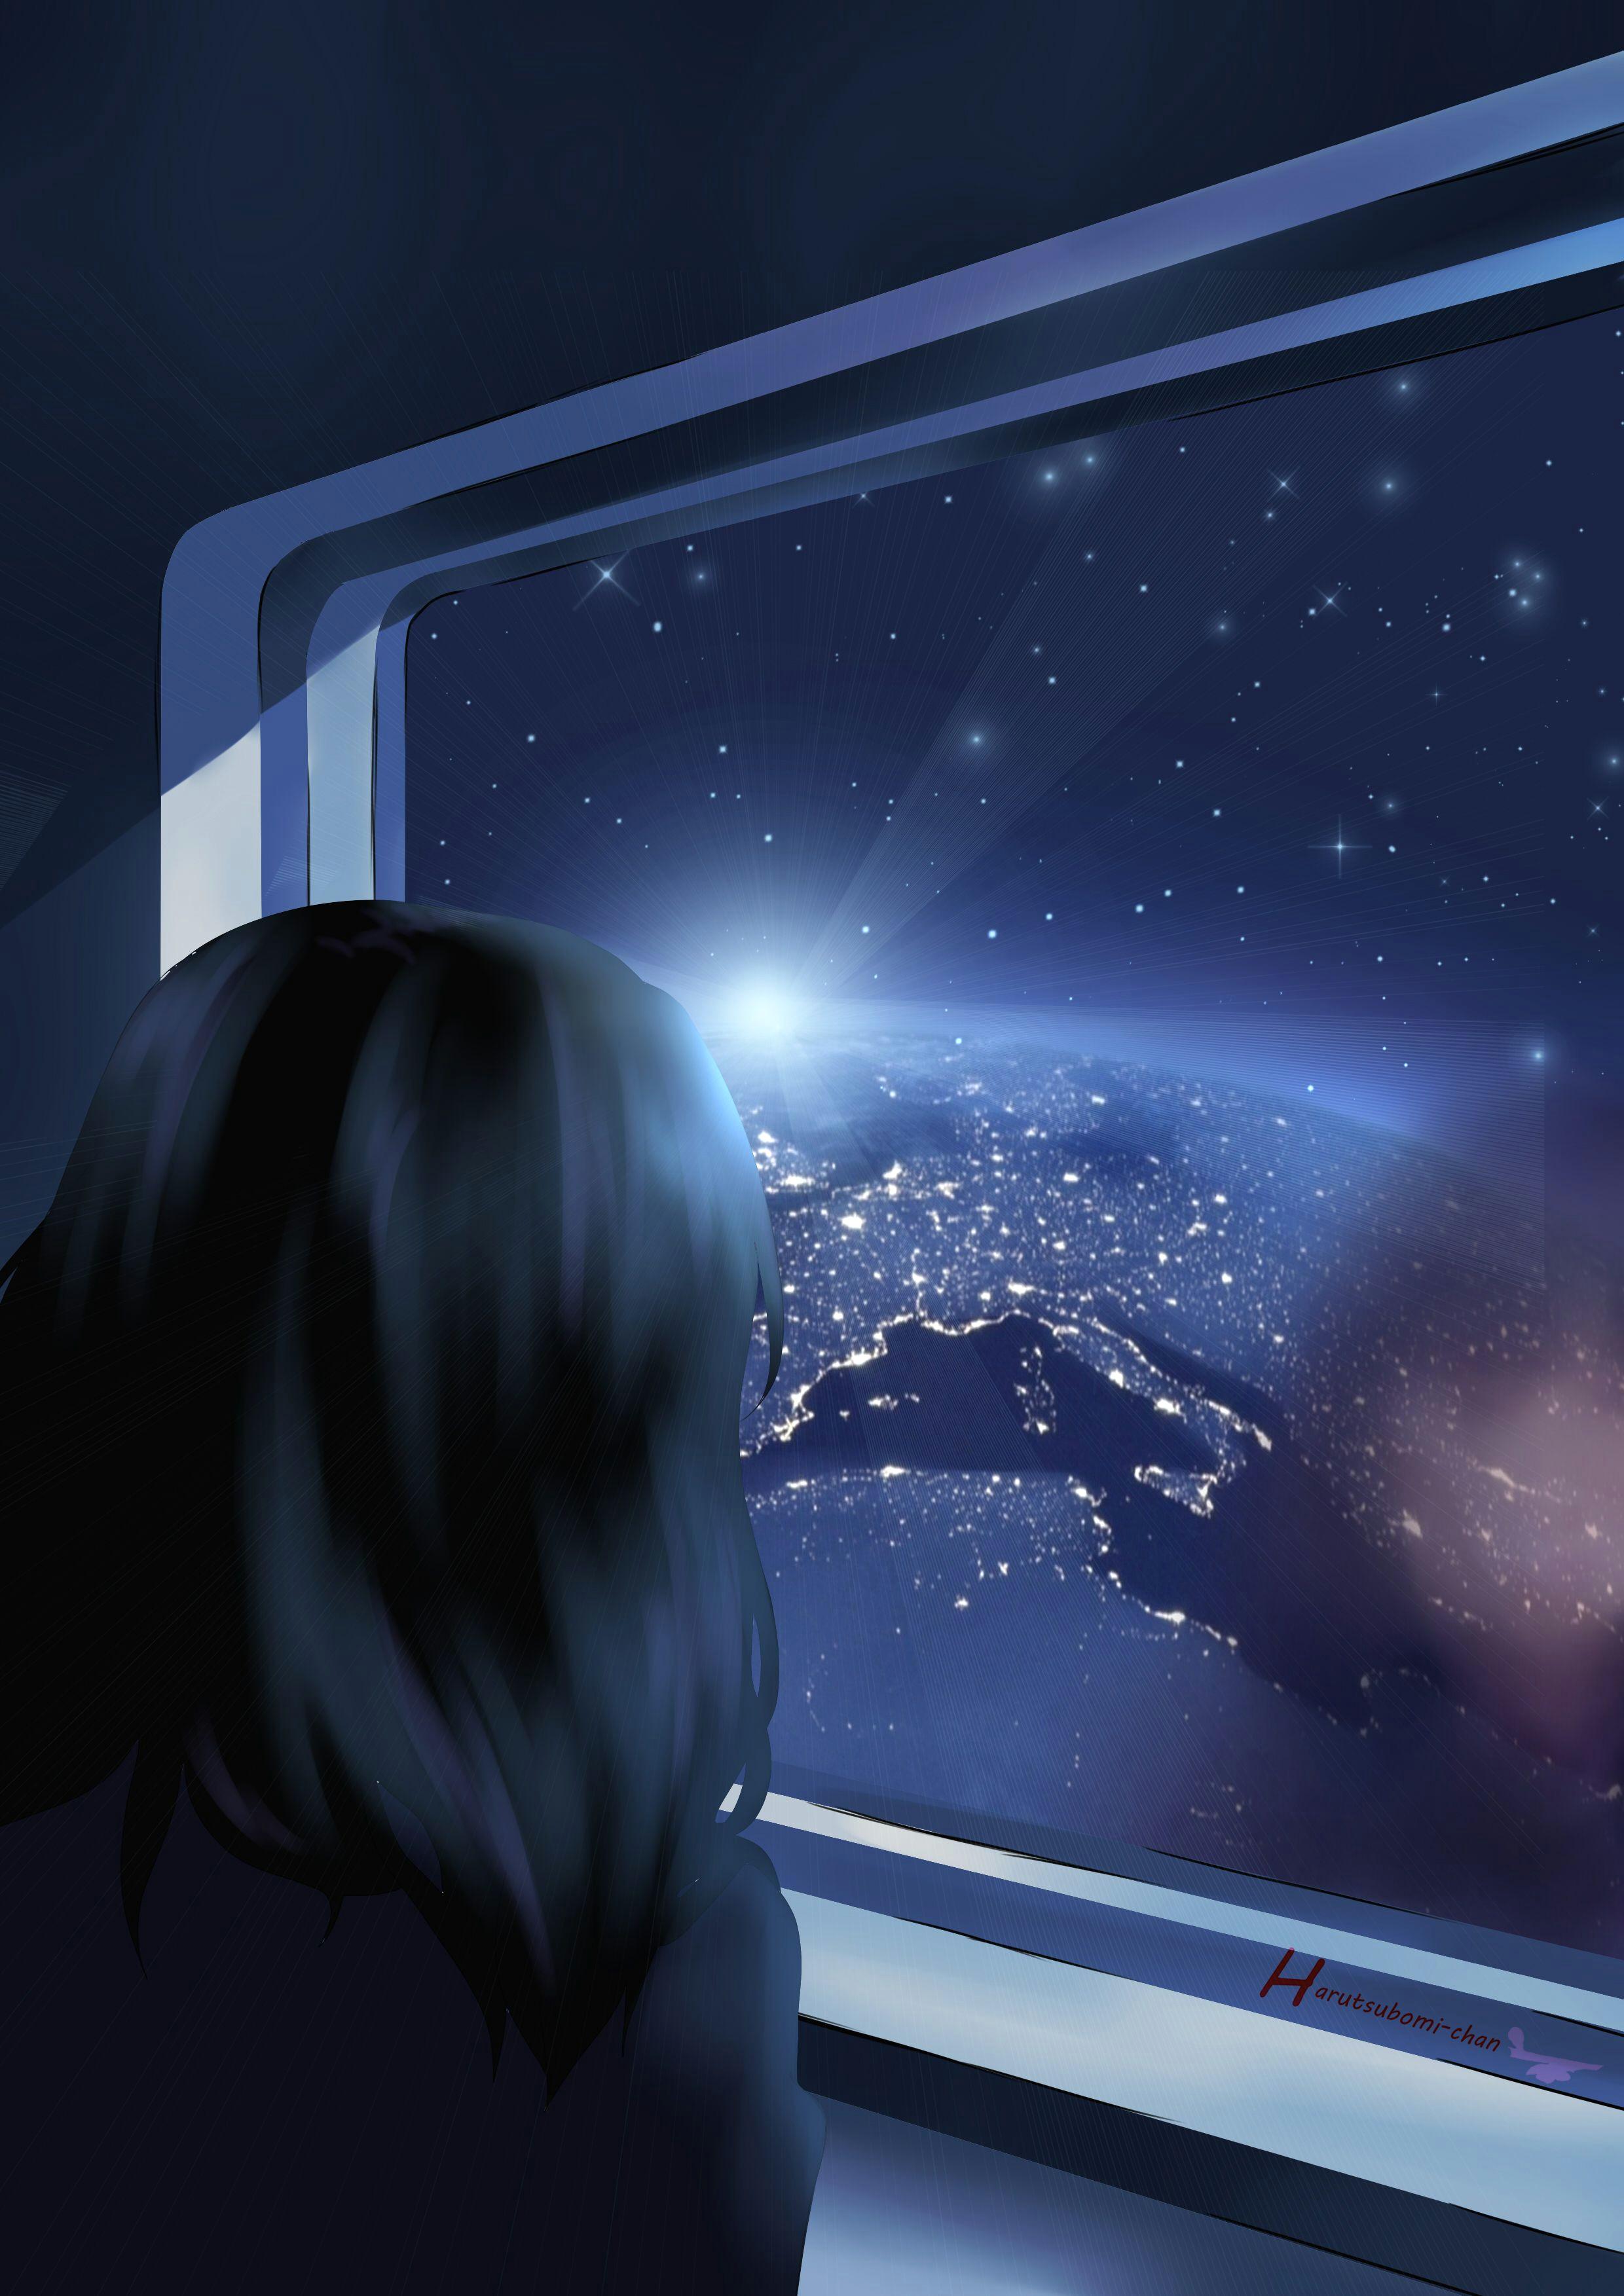 space window girl drawing painting anime manga planet